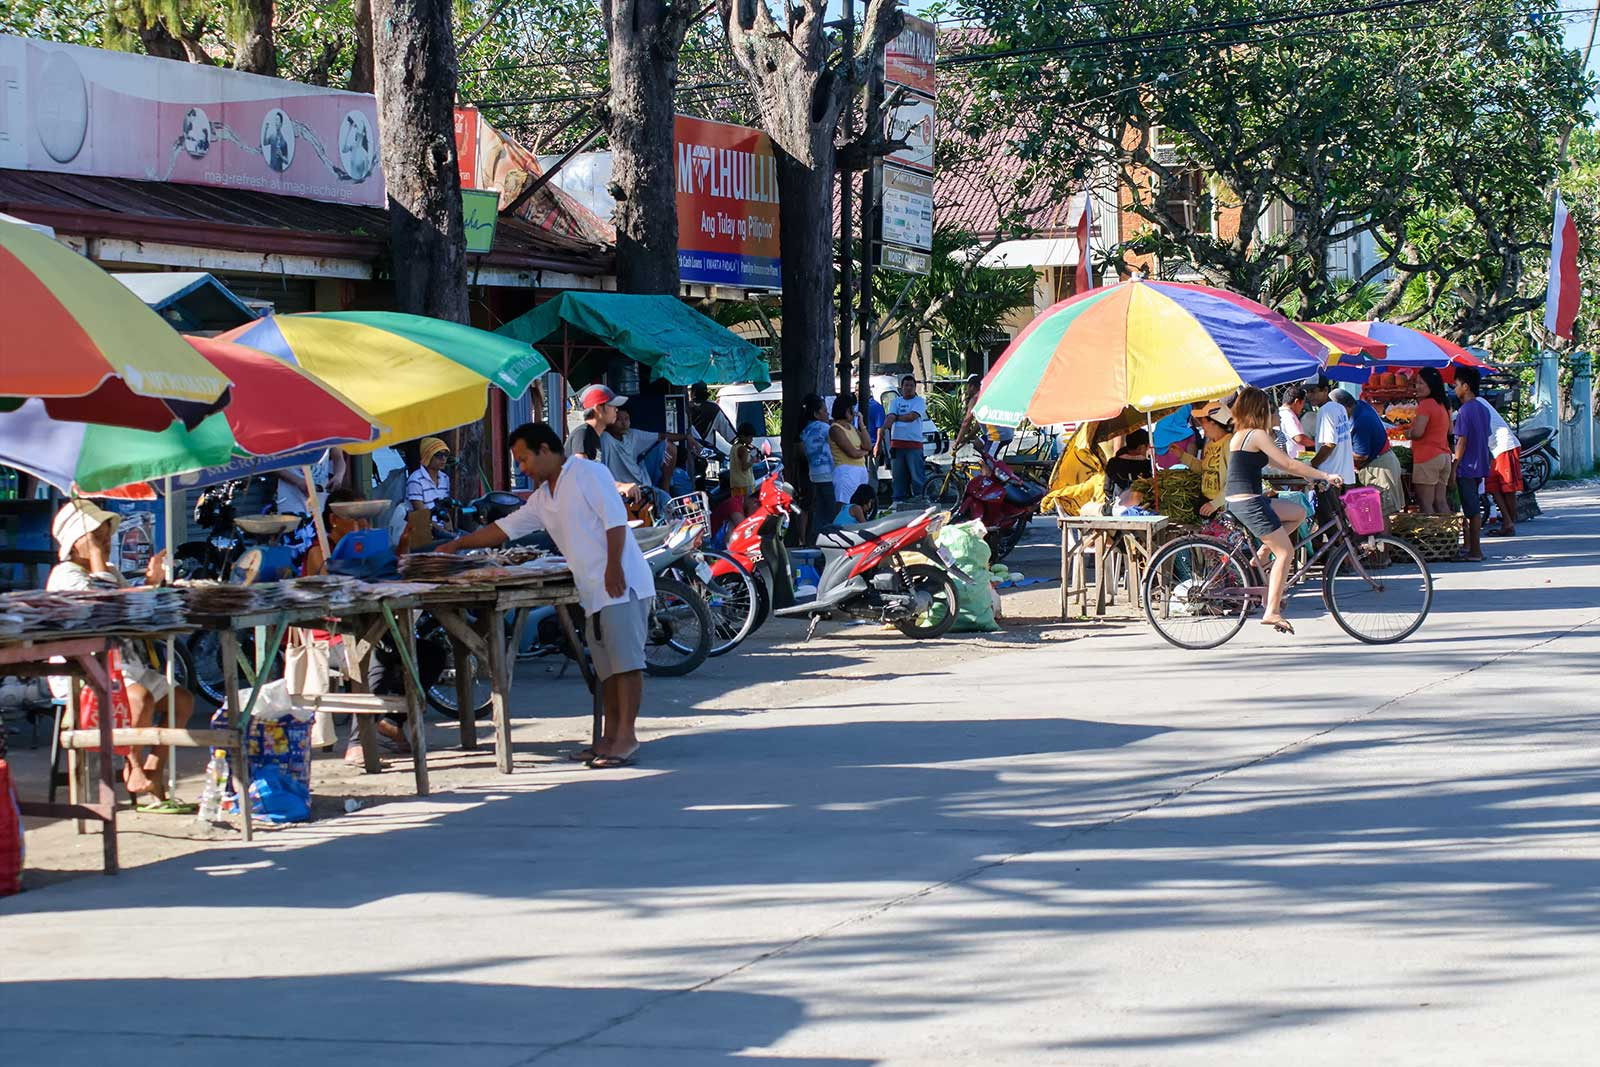 Market day in downtown Santa Fe, Bantayan Island